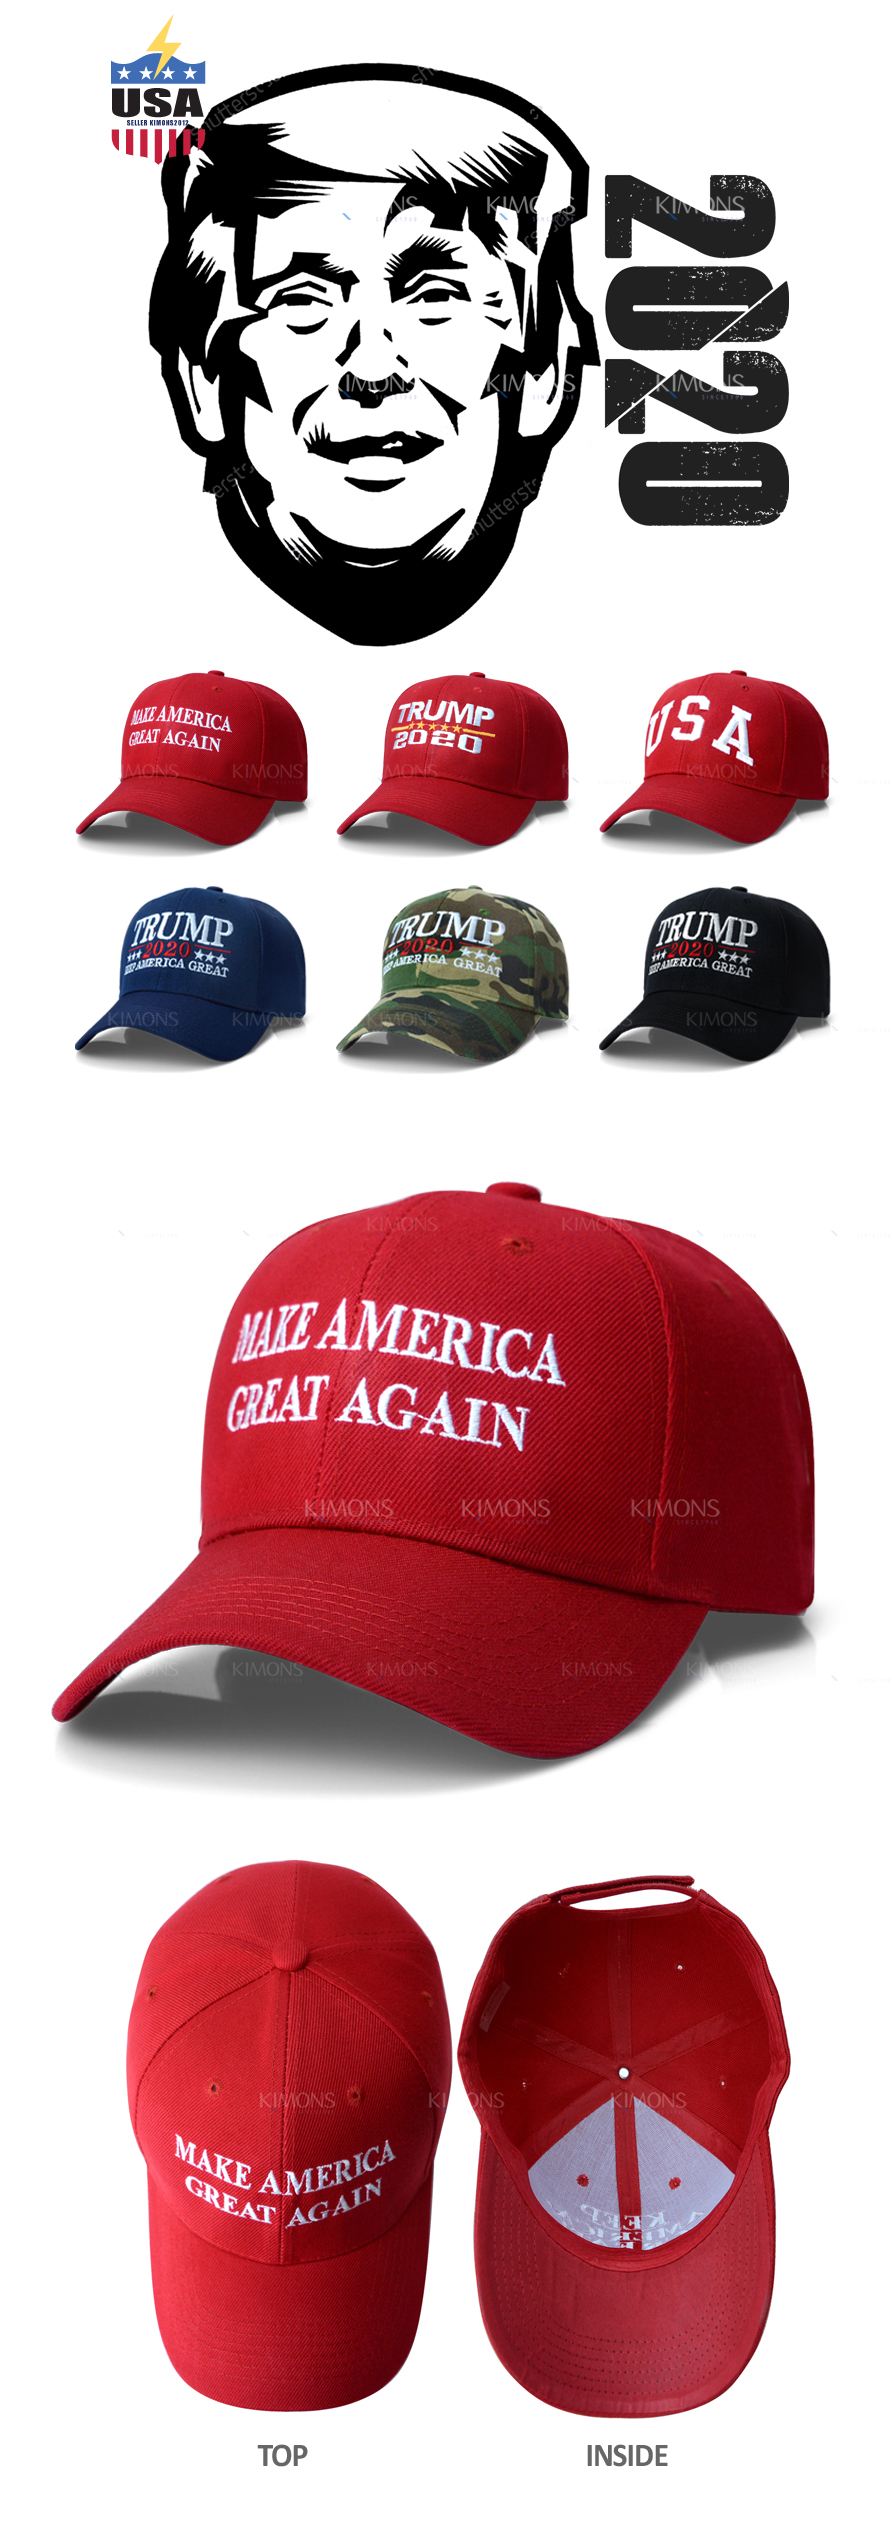 7ff09500ad3 Trump Hat Cap President Make America Great Again MAGA Baseball RED ...